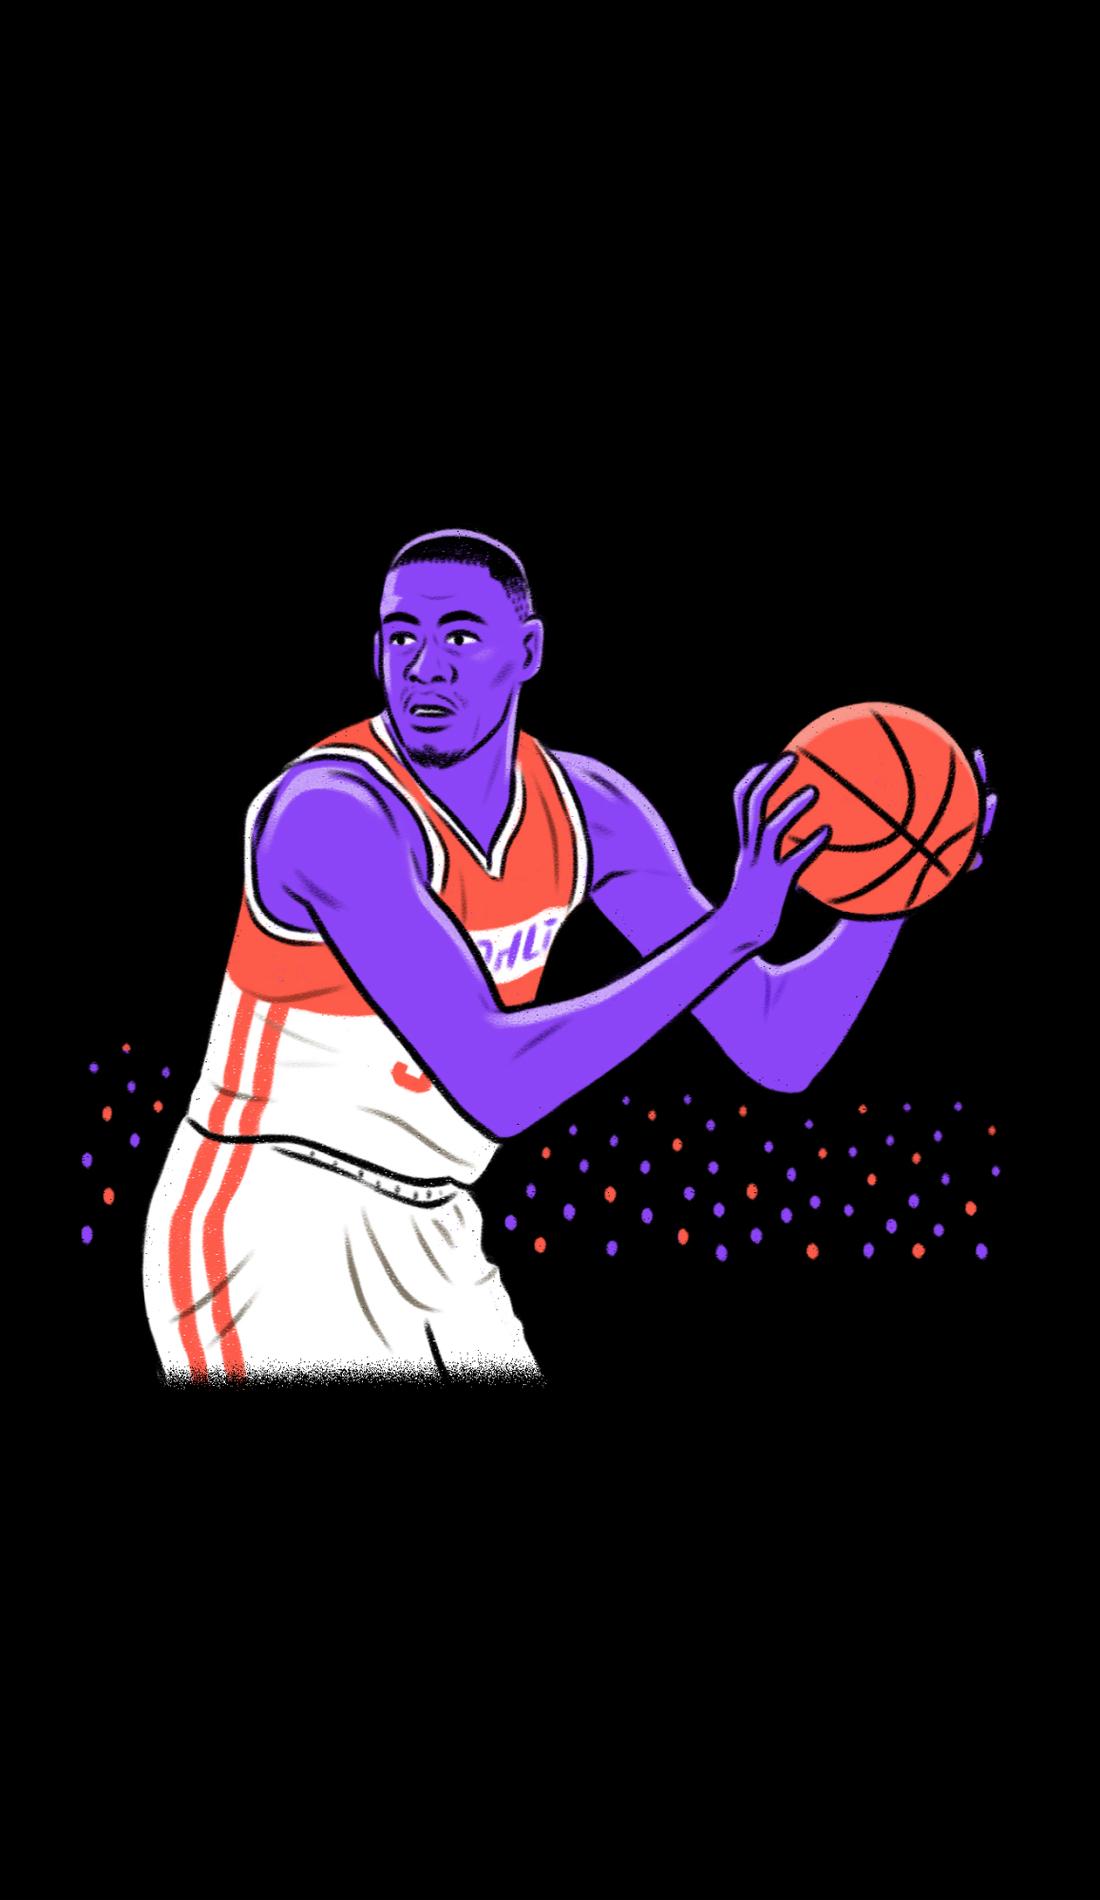 A Illinois Fighting Illini Basketball live event